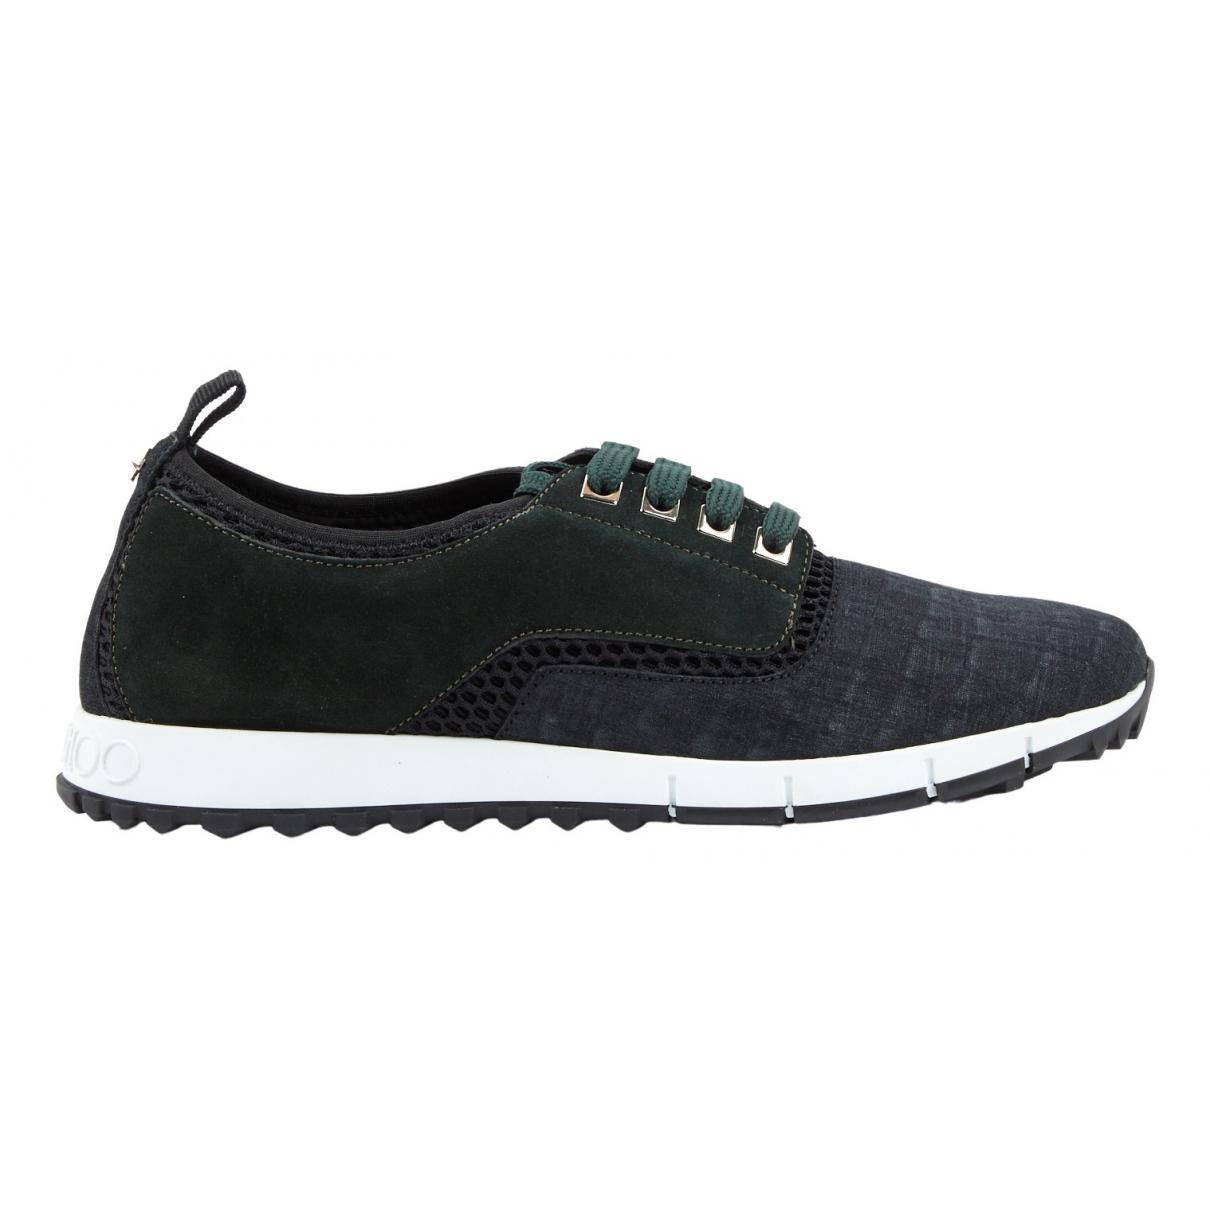 Jimmy Choo \N Sneakers in  Anthrazit Veloursleder